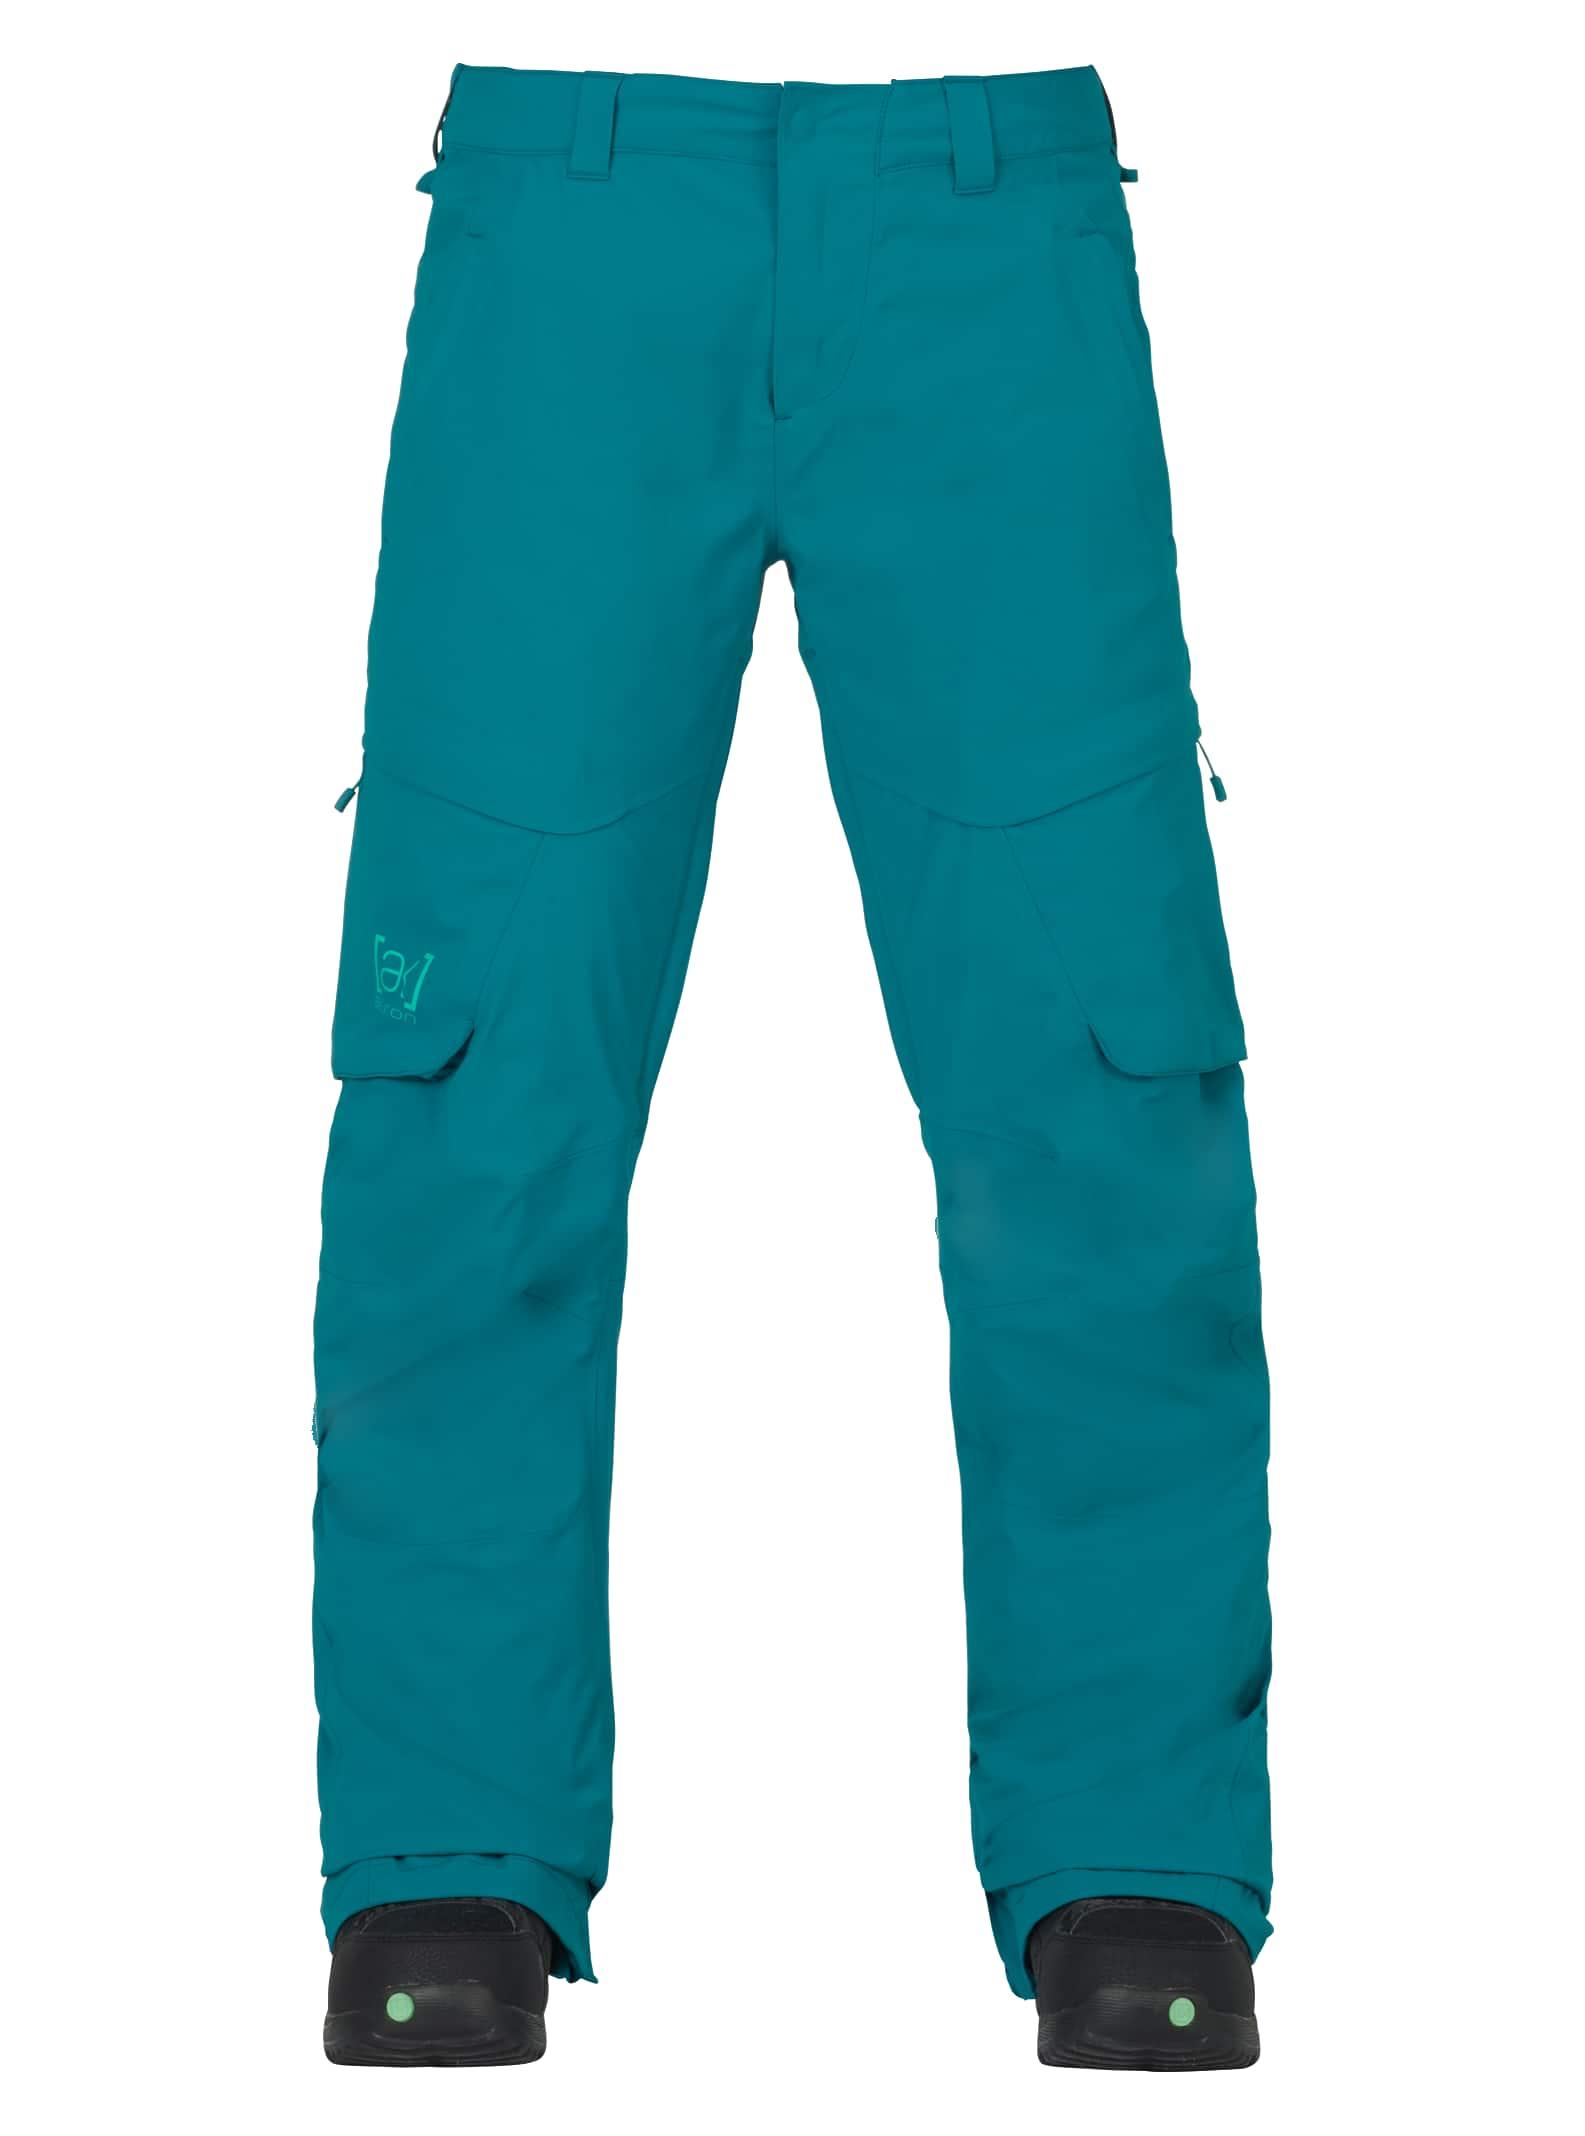 03a9909888f Women s Snowboard Pants   Bibs